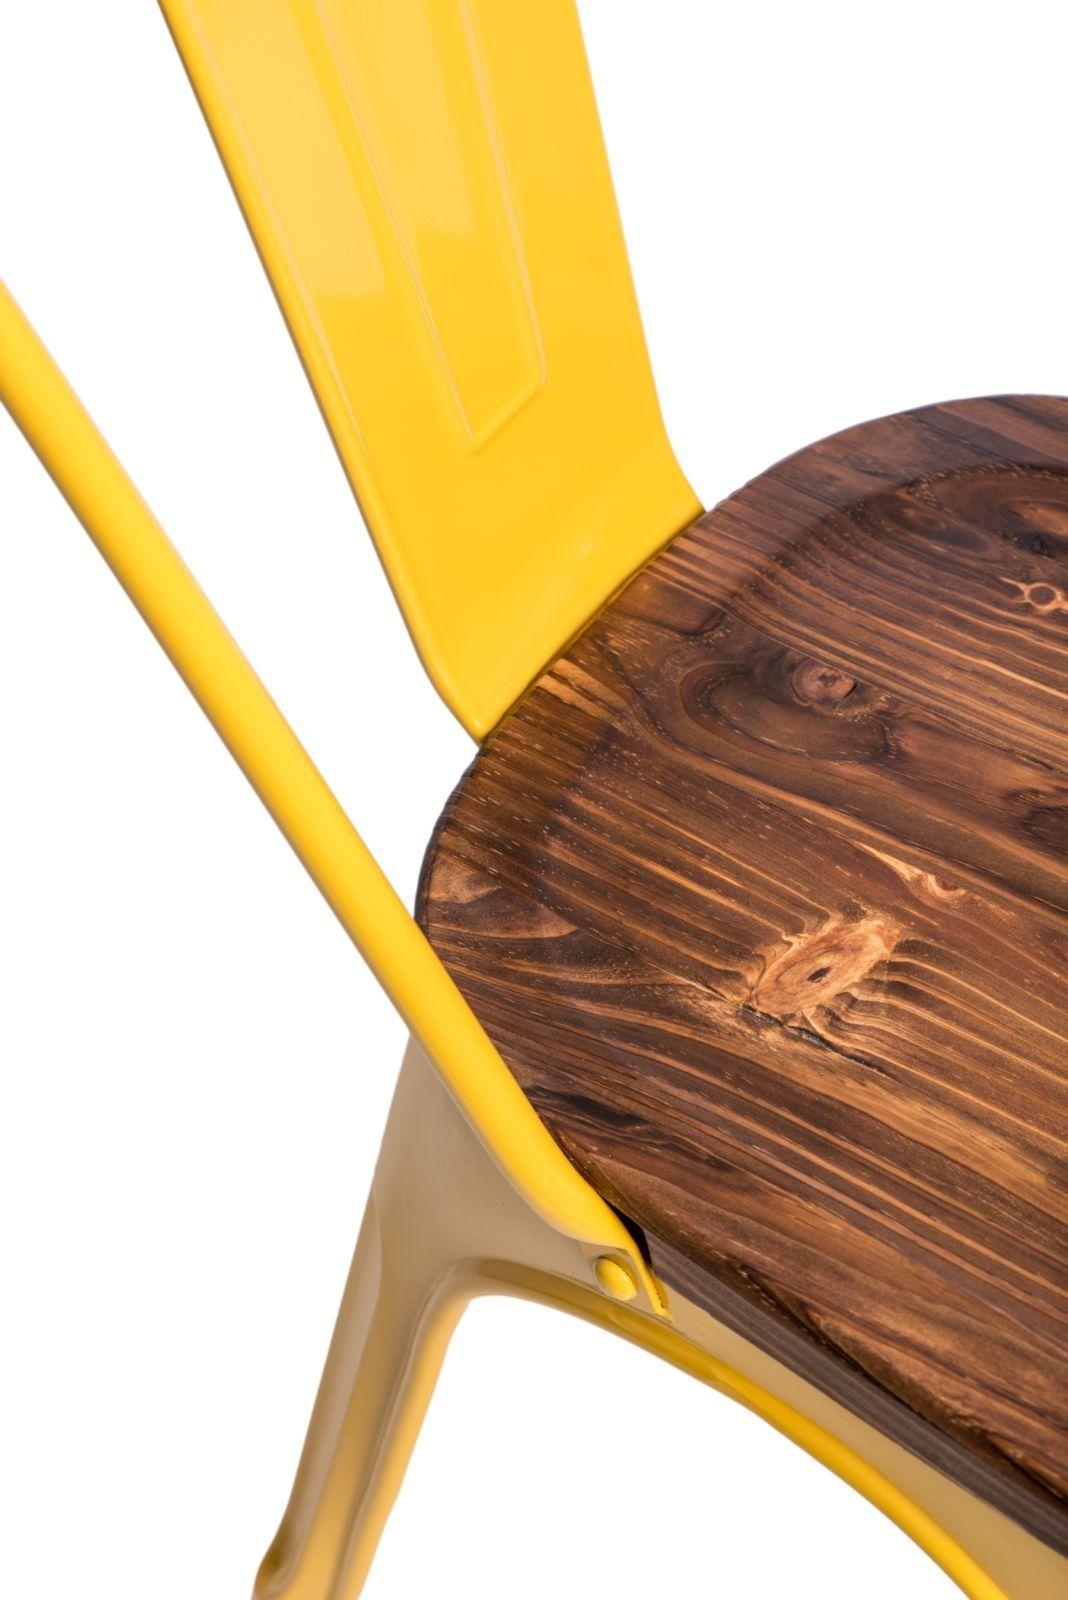 D2 Krzesło Paris Wood żółty sosna